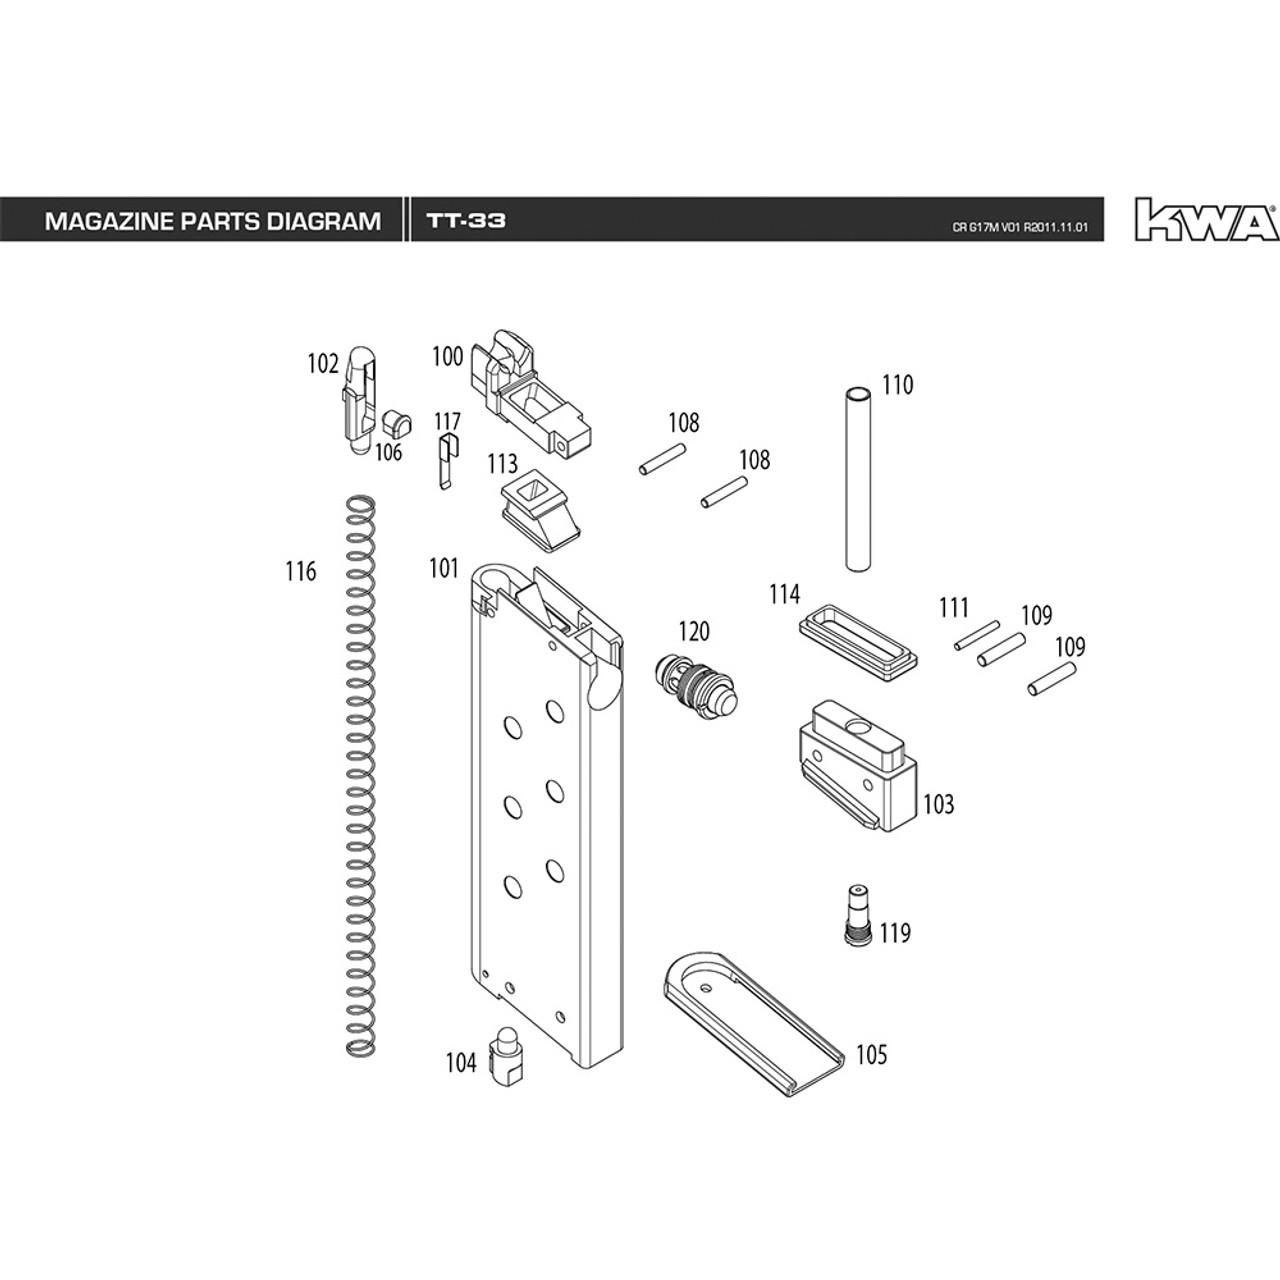 small resolution of kwa airsoft tt 33 magazine diagram